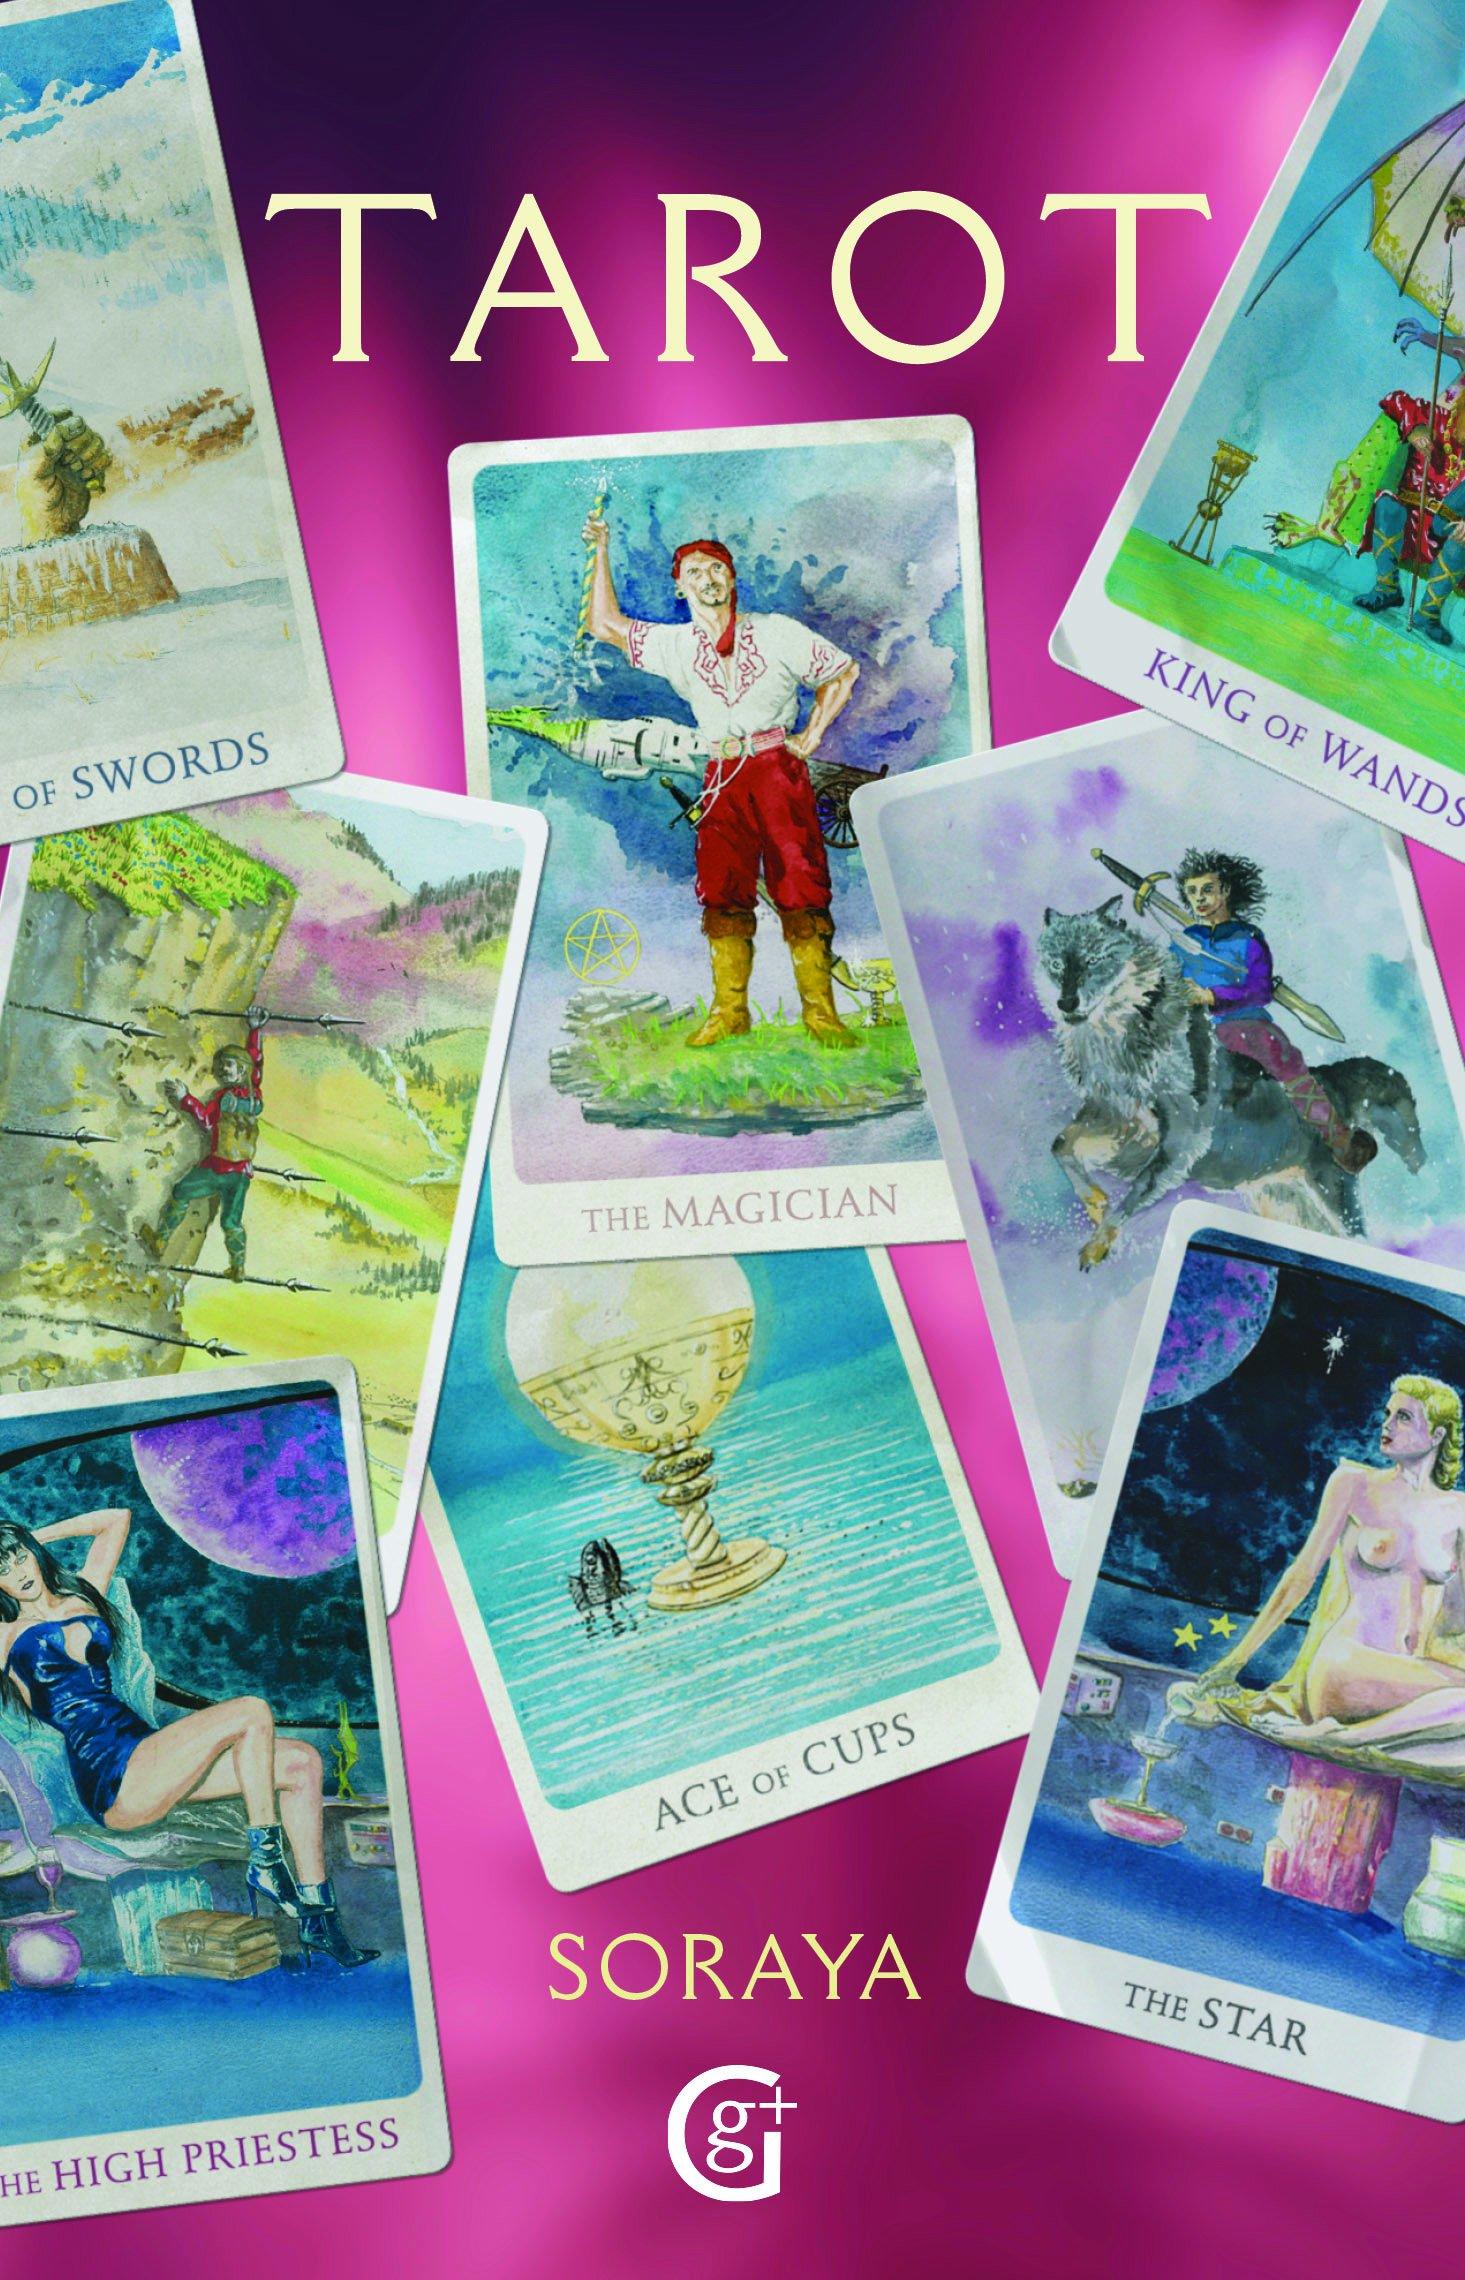 Tarot (Soraya Series): Amazon co uk: Soraya, Martin Conway